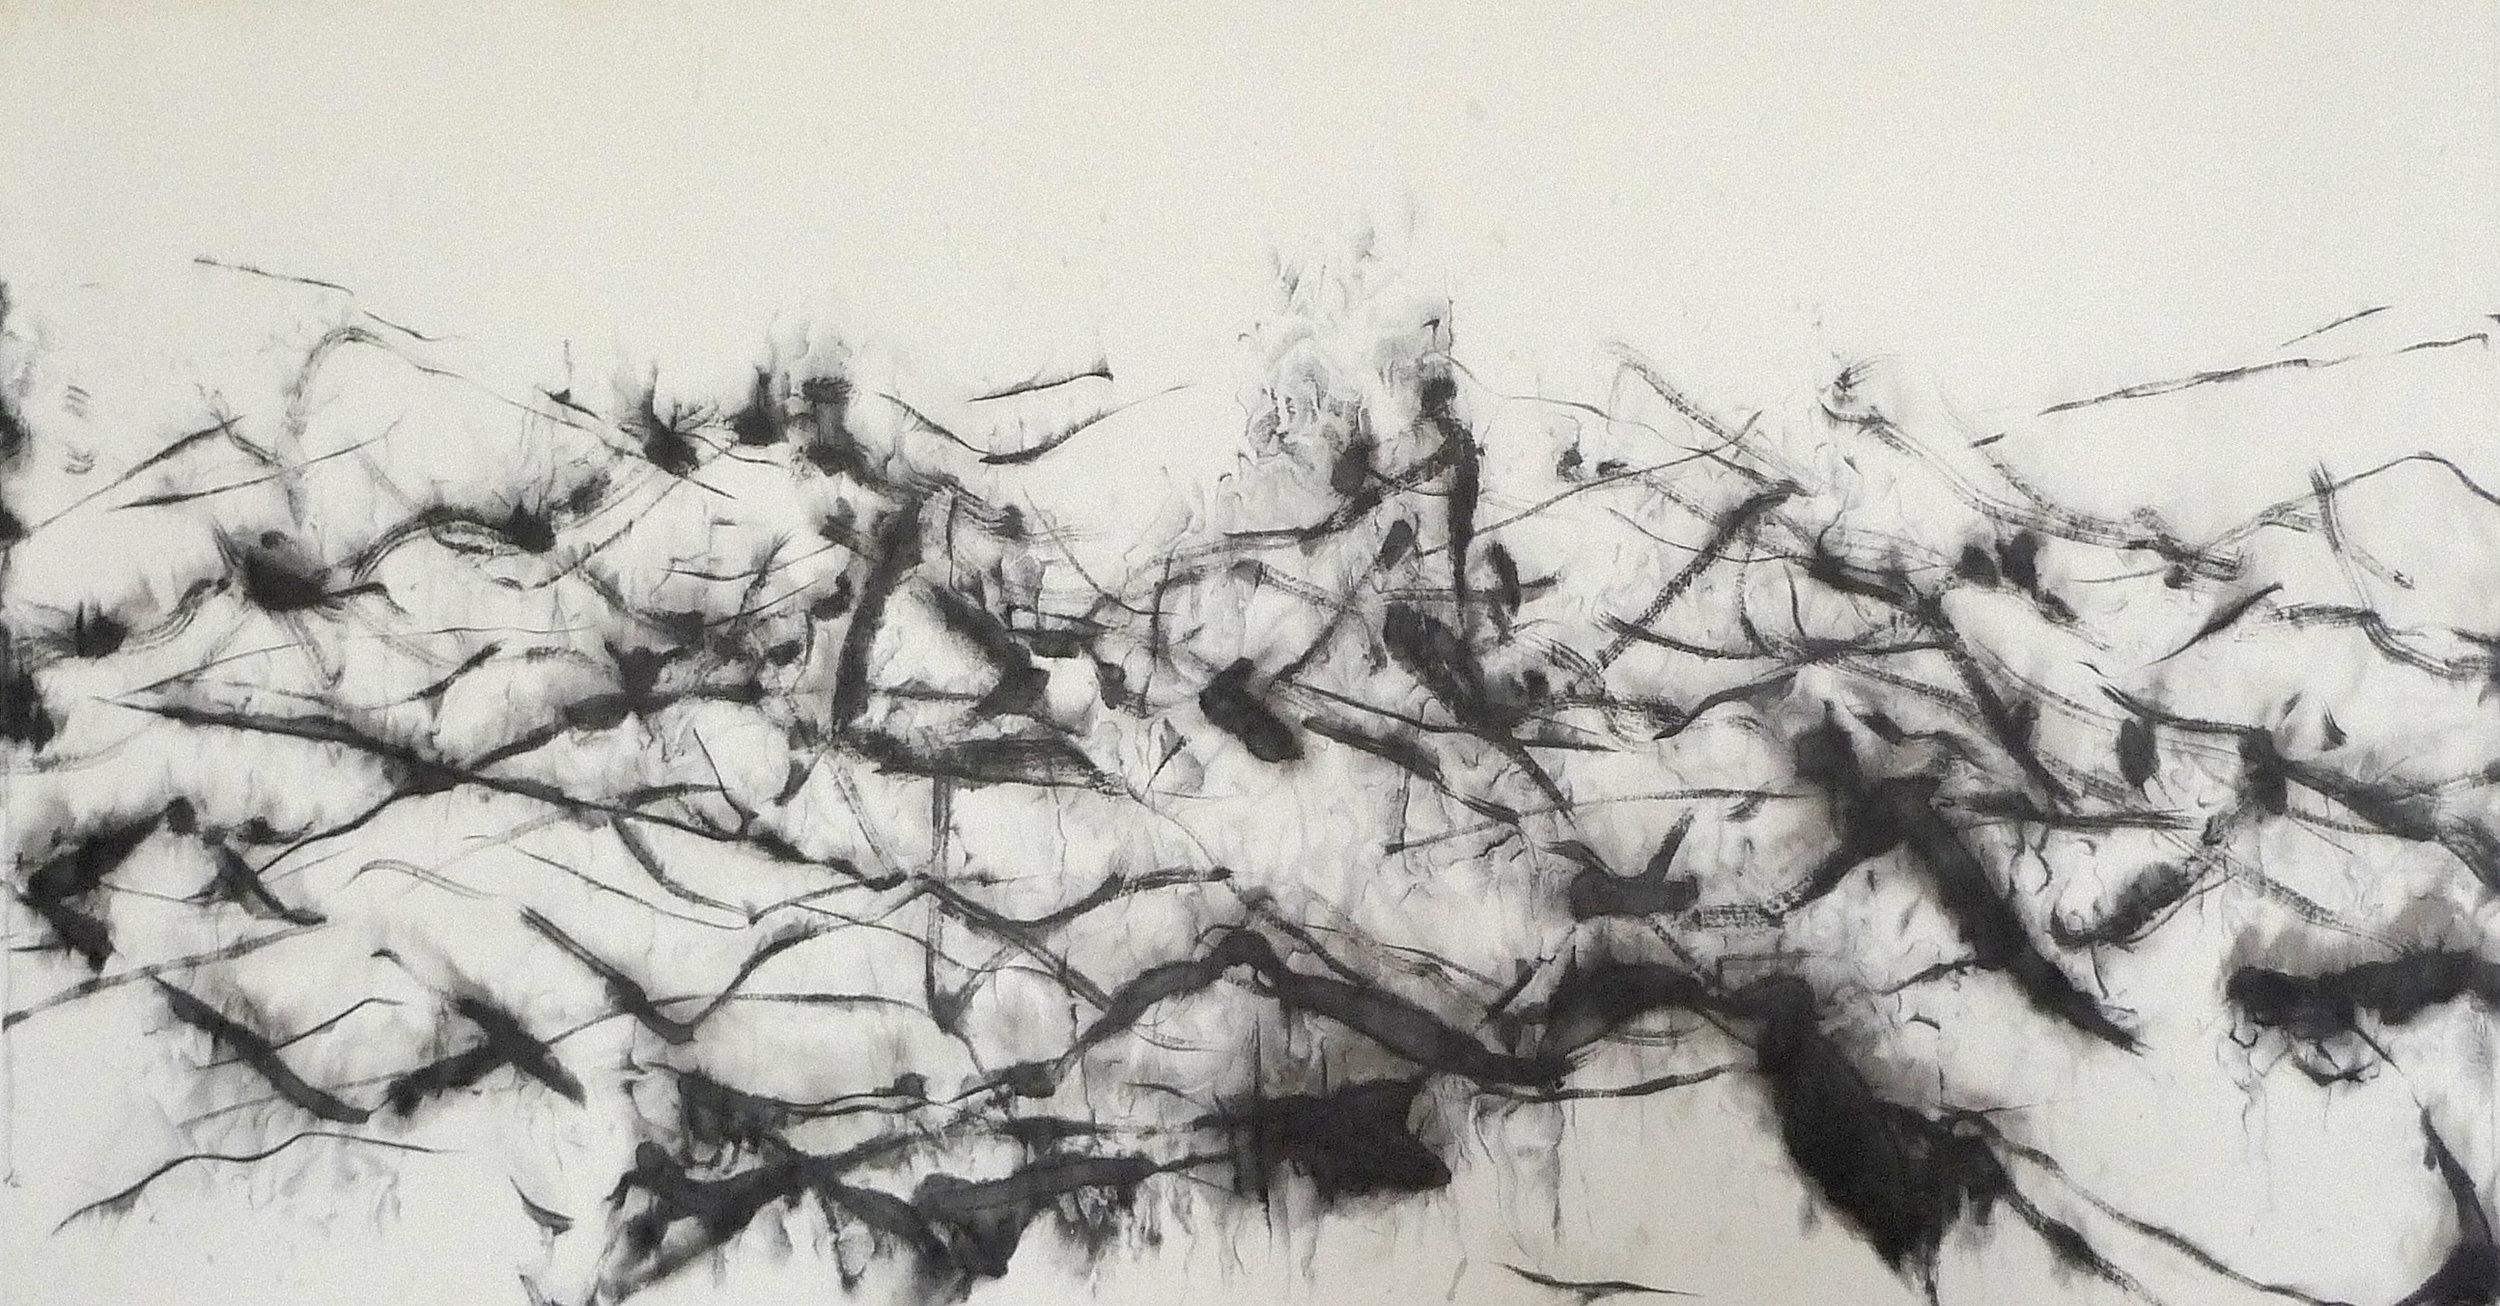 Zhou Jianjun 周建军, Untitled 无题, 2015, Ink on paper 纸本水墨设色, 95 x 176 cm